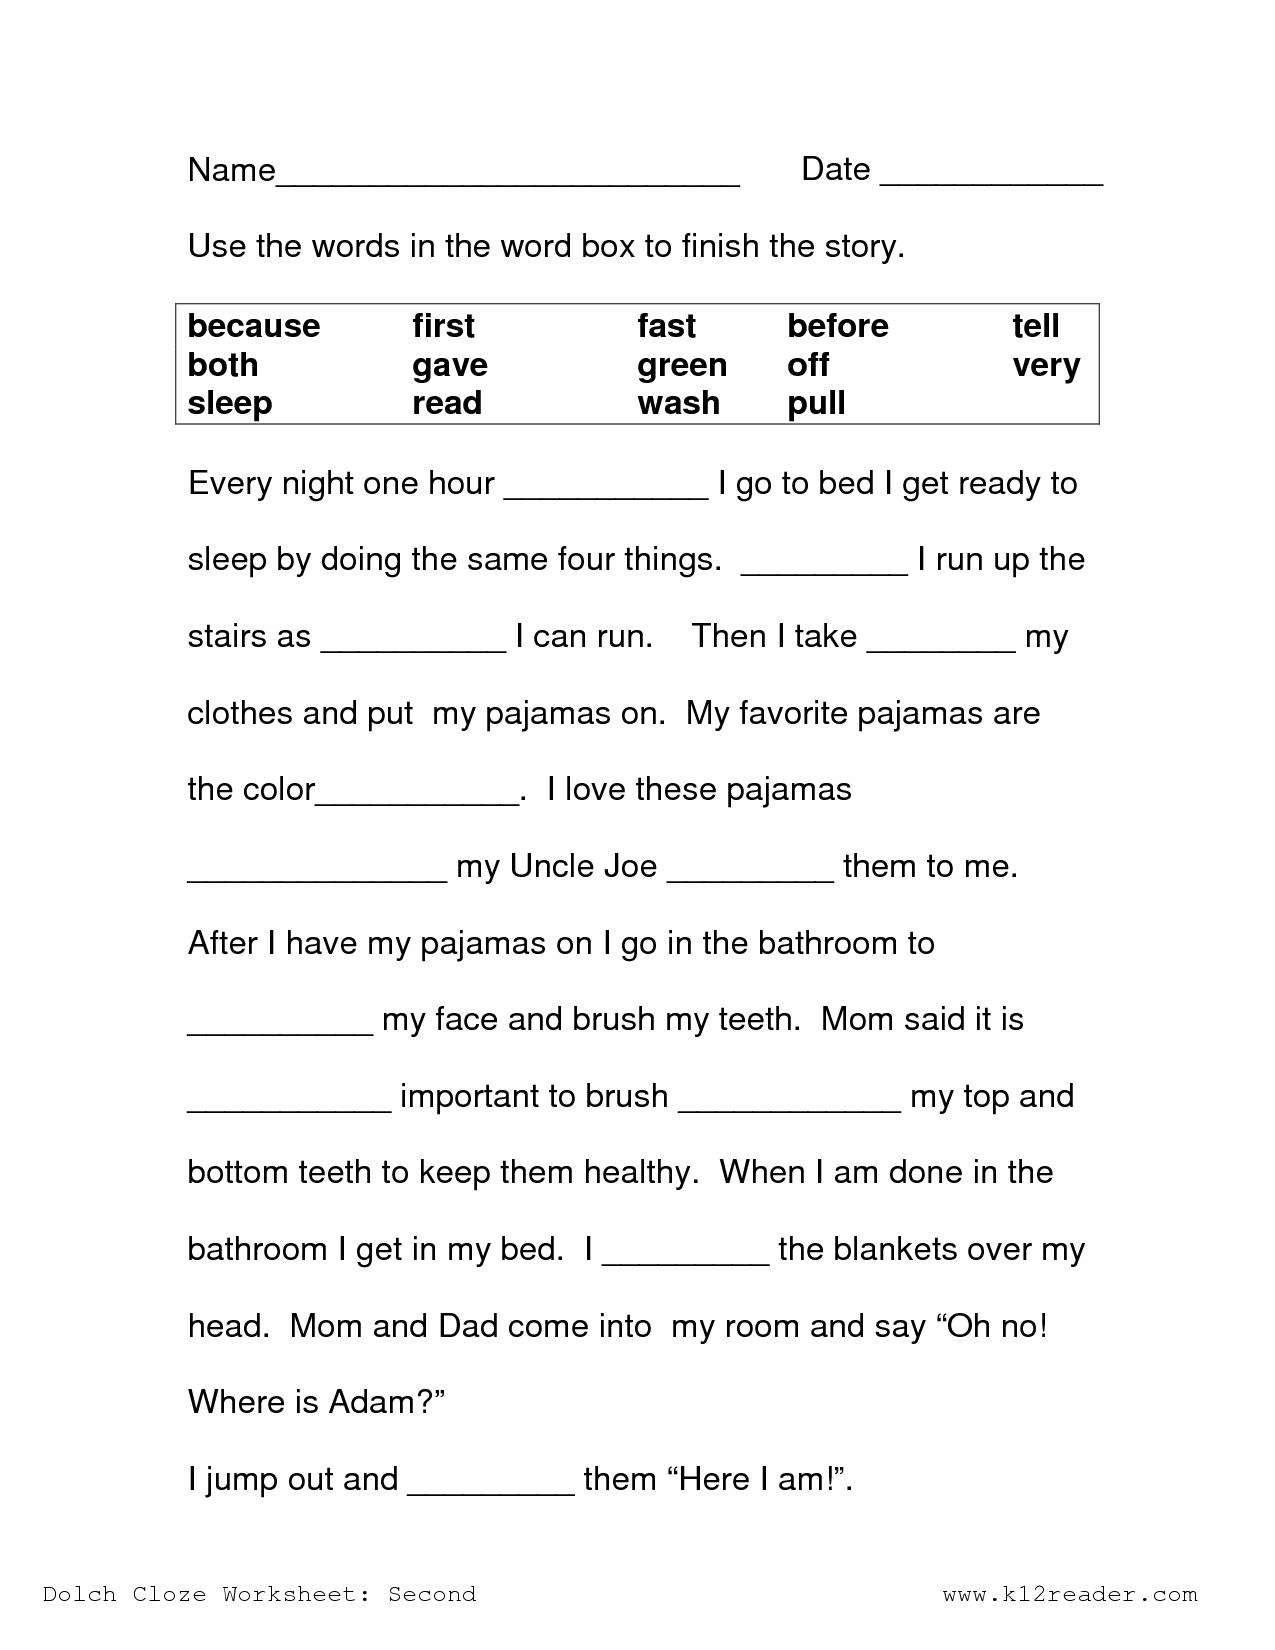 Free Printable Reading Comprehension Worksheets 3Rd Grade To Print - Free Printable Reading Comprehension Worksheets